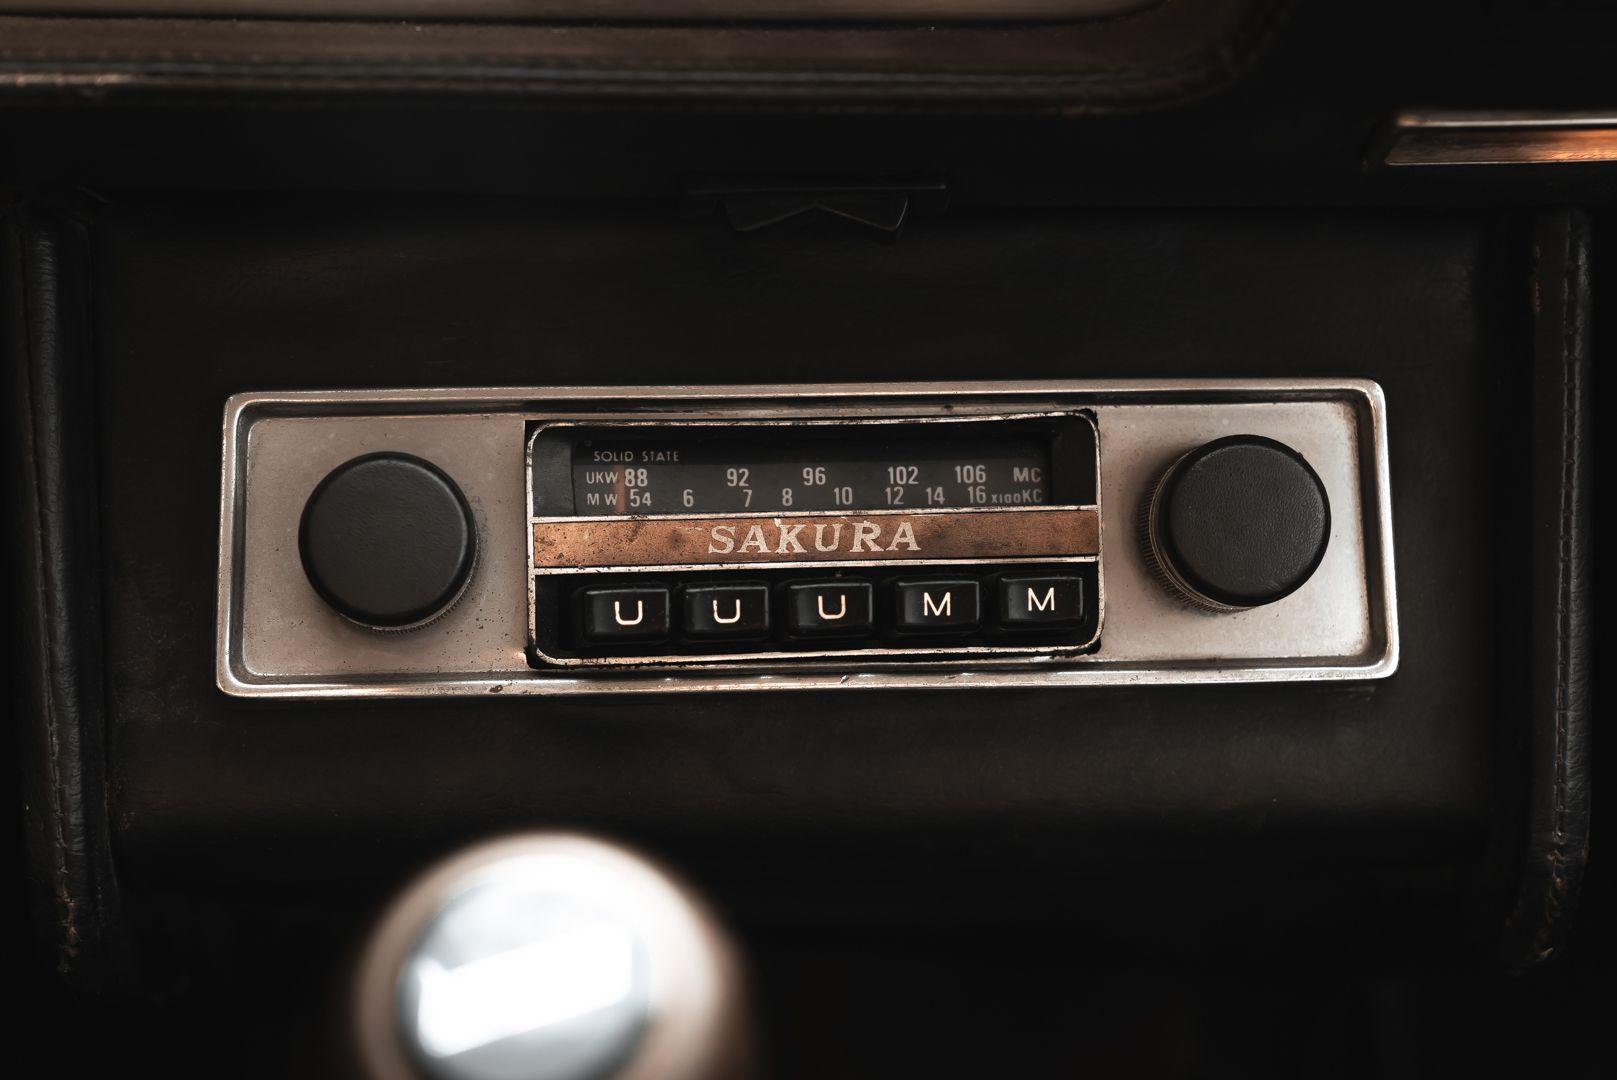 1969 Fiat 124 Coupé Eveline Vignale 81766